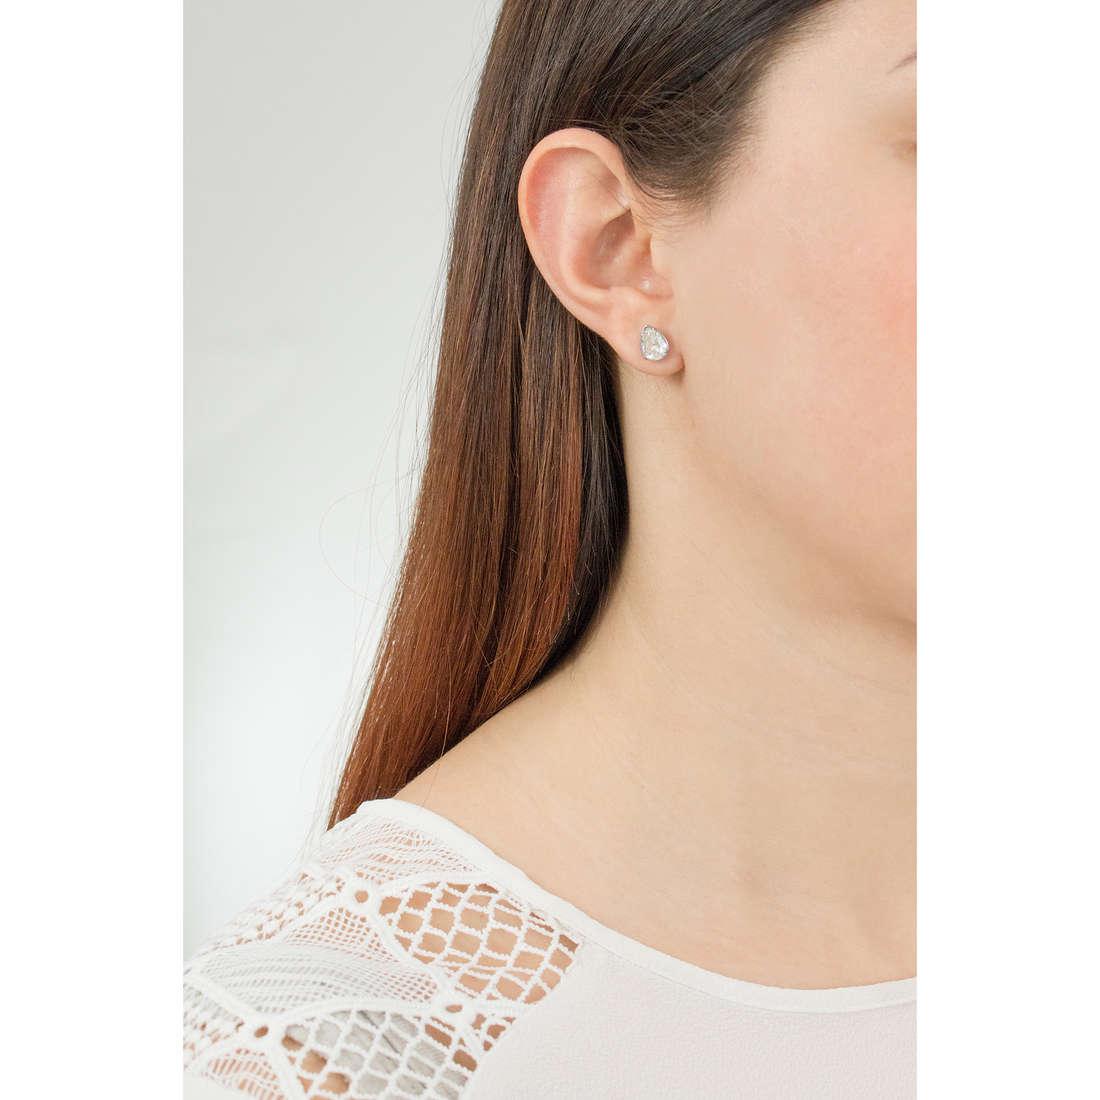 Brosway orecchini Affinity donna BFF30 indosso